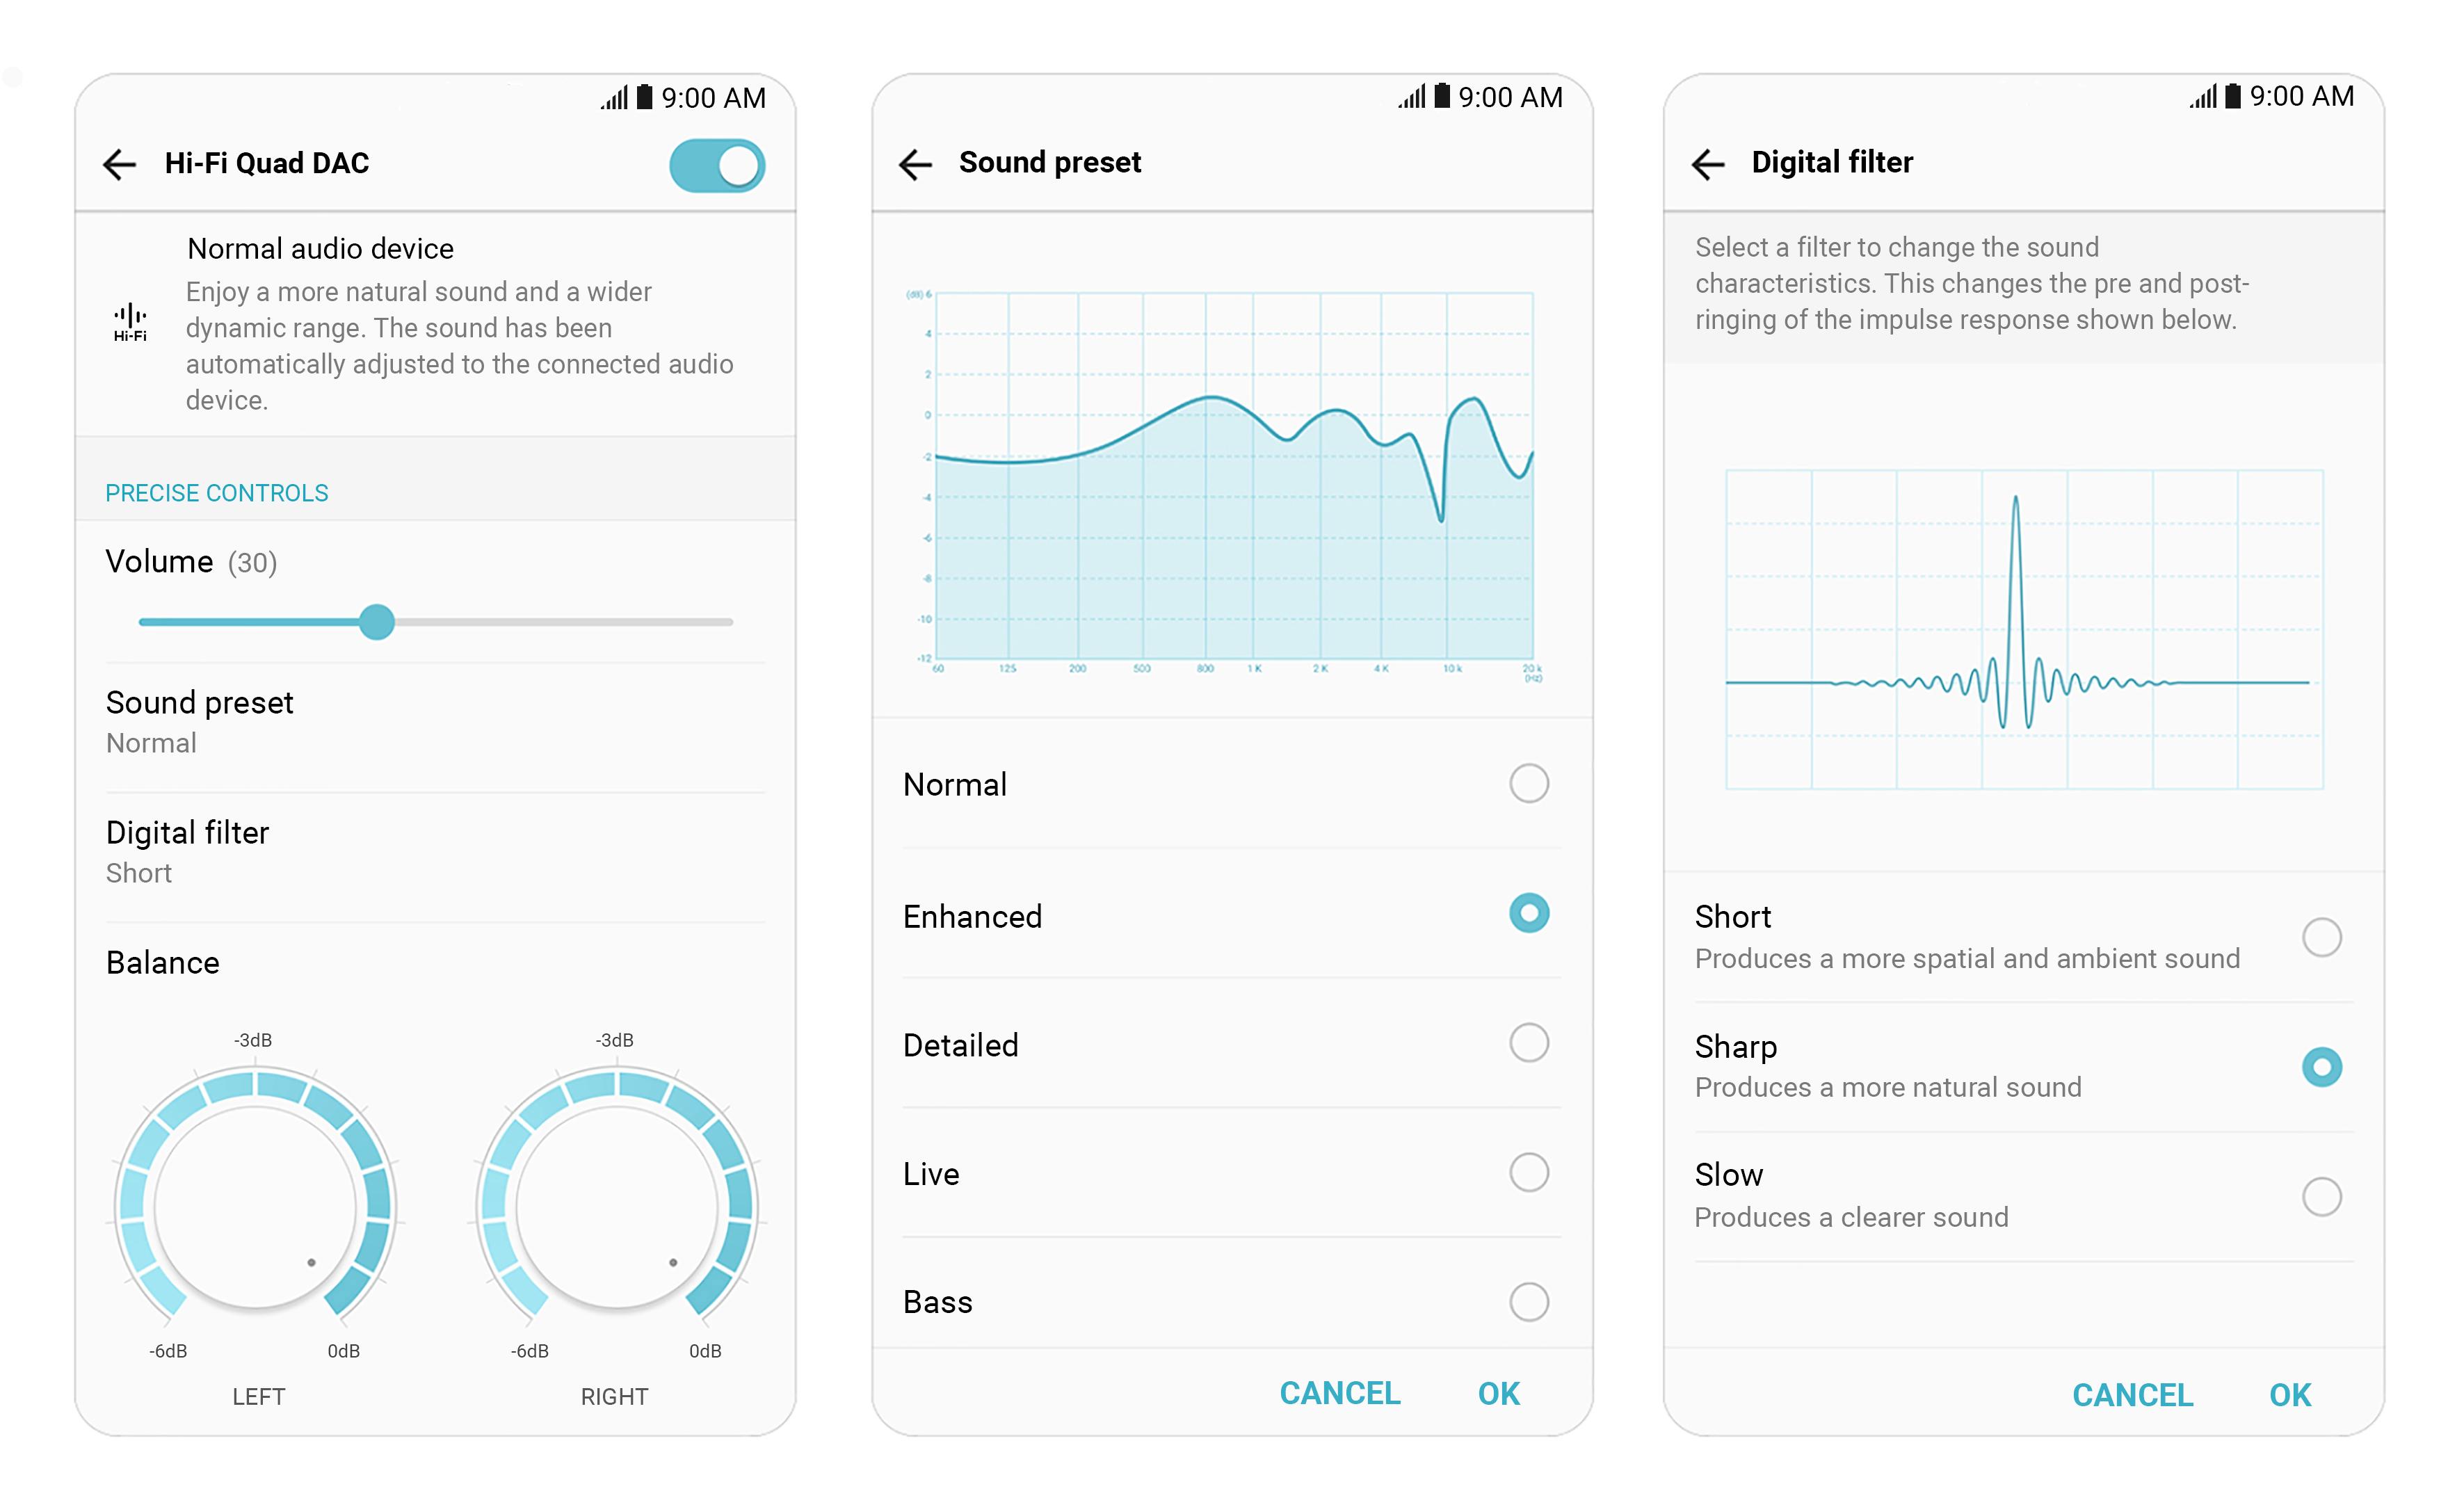 LG revealed details about the smartphone LG V30